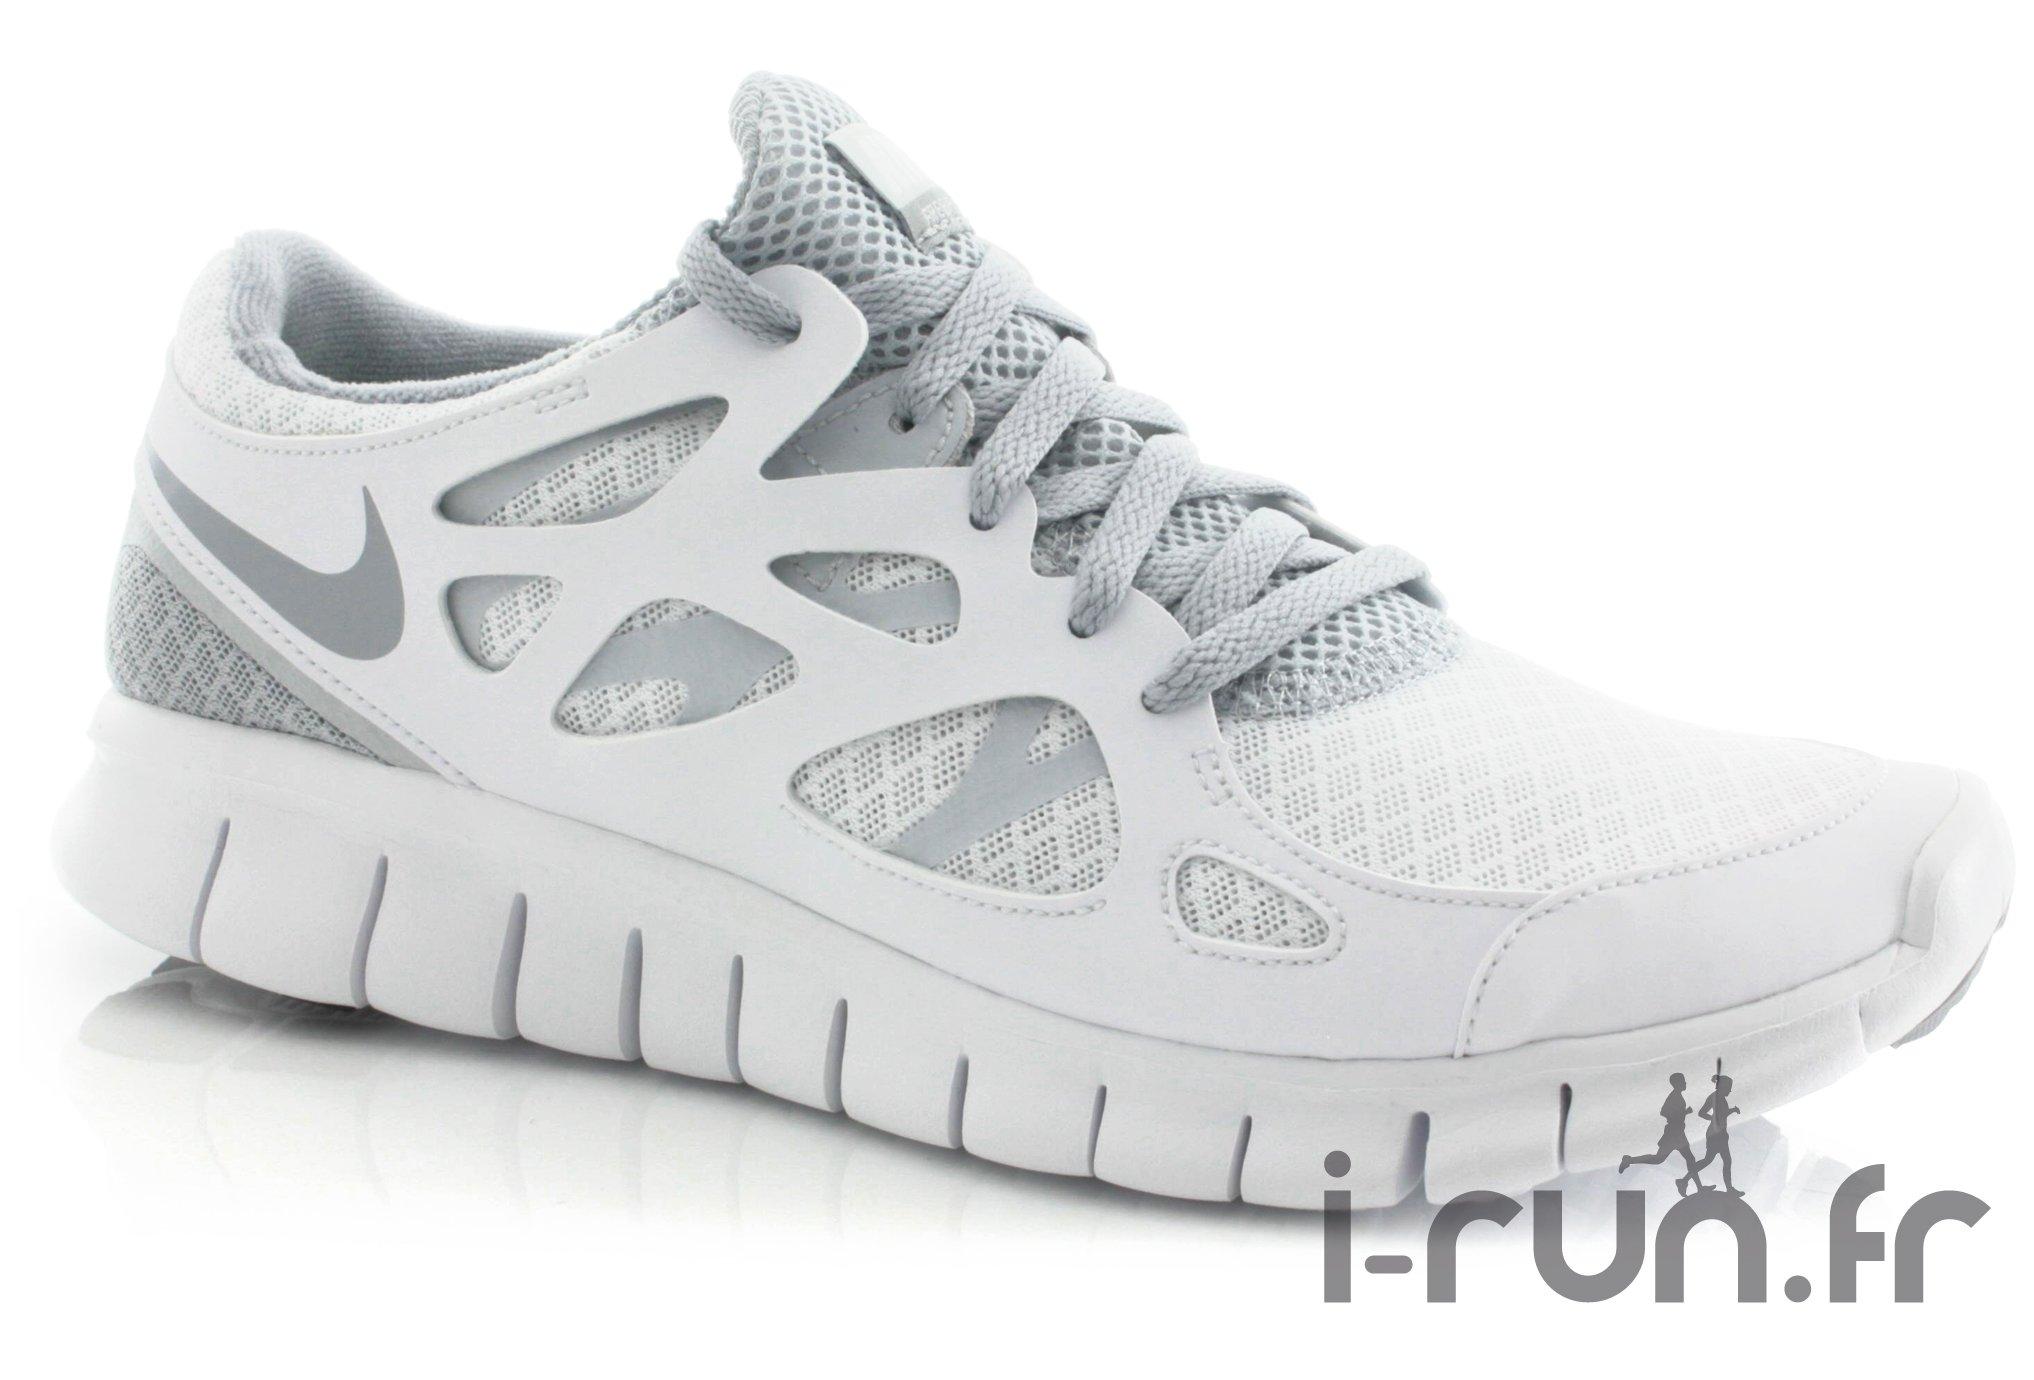 67b30d044ba Nike Free Run + 2 W Blanche femme pas cher